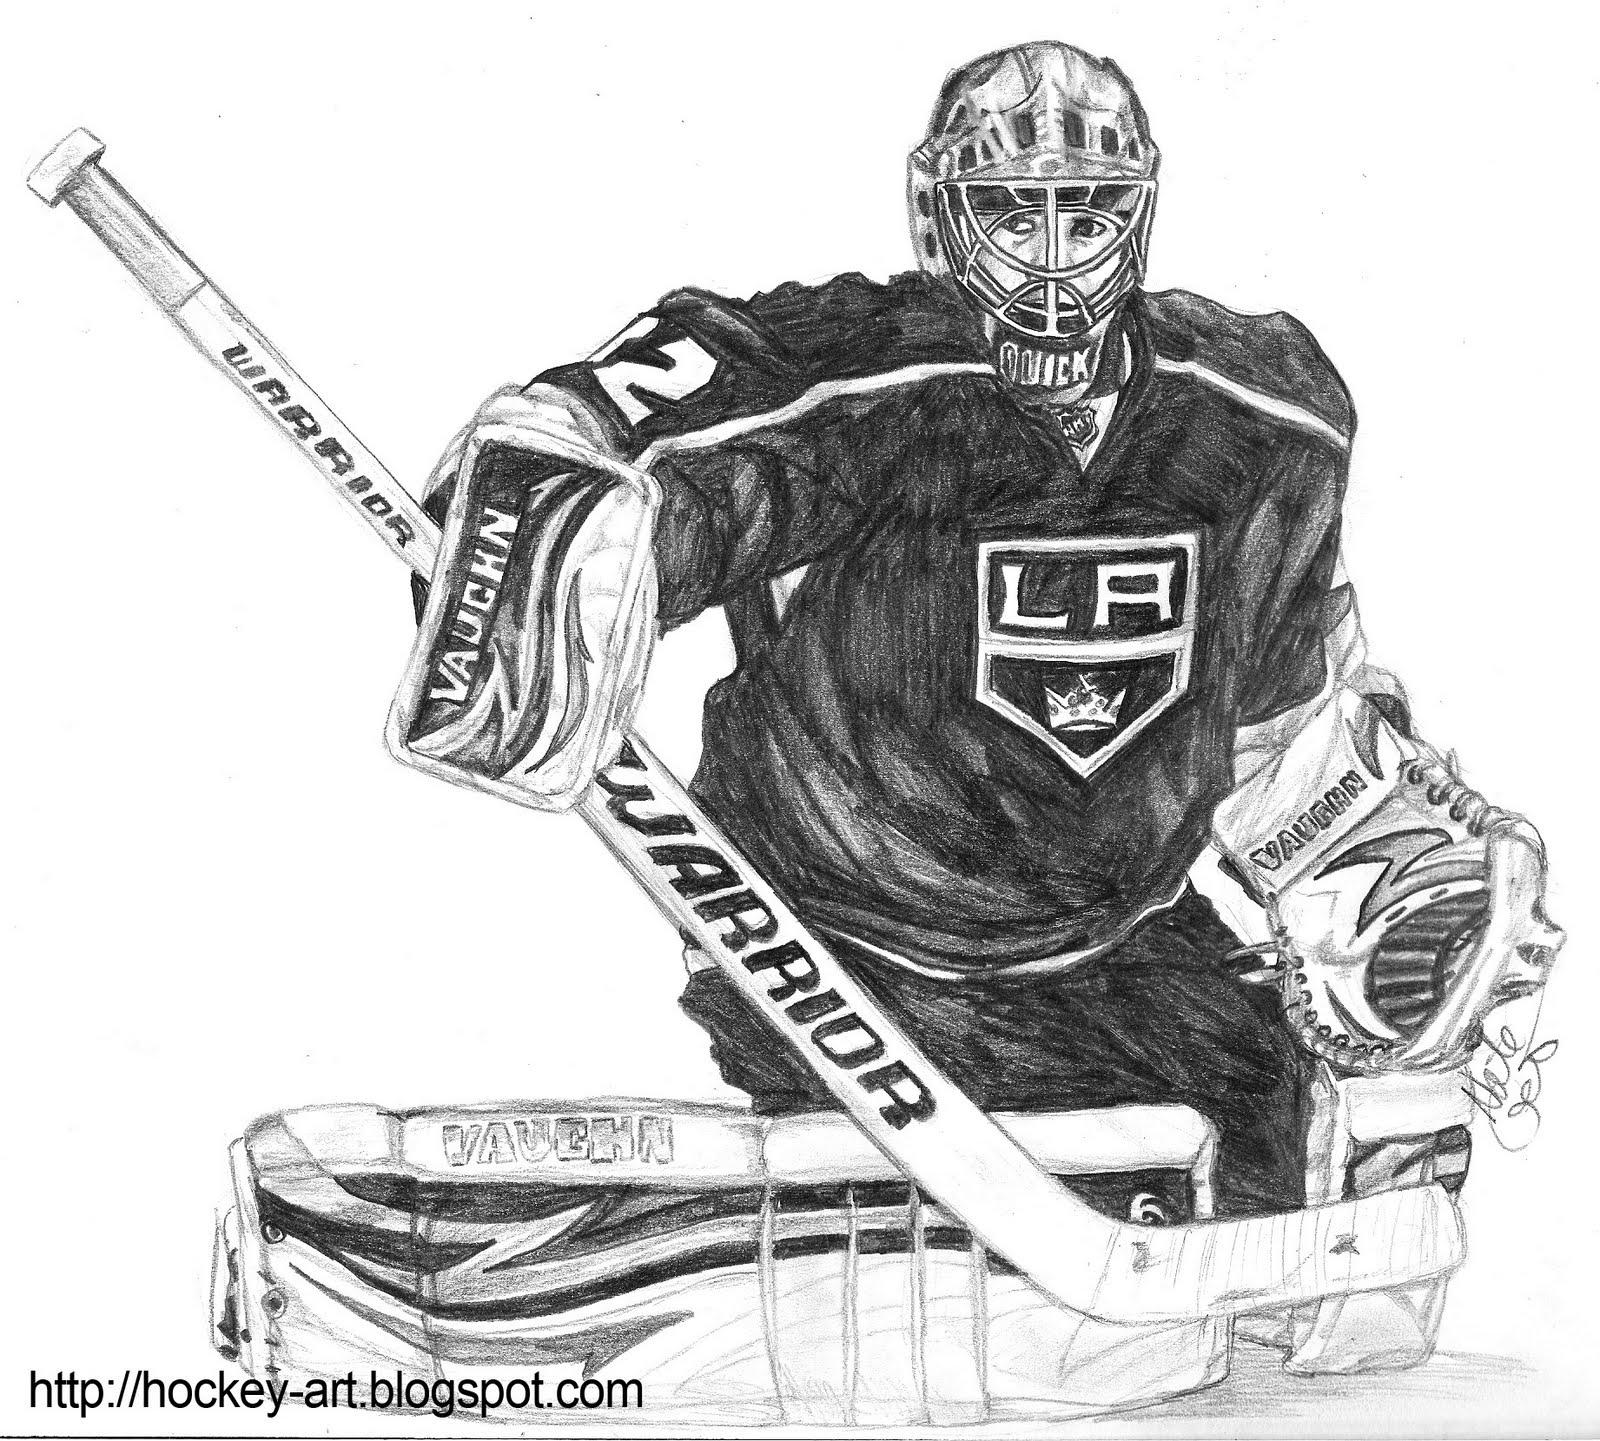 Hockey in art: April 2011